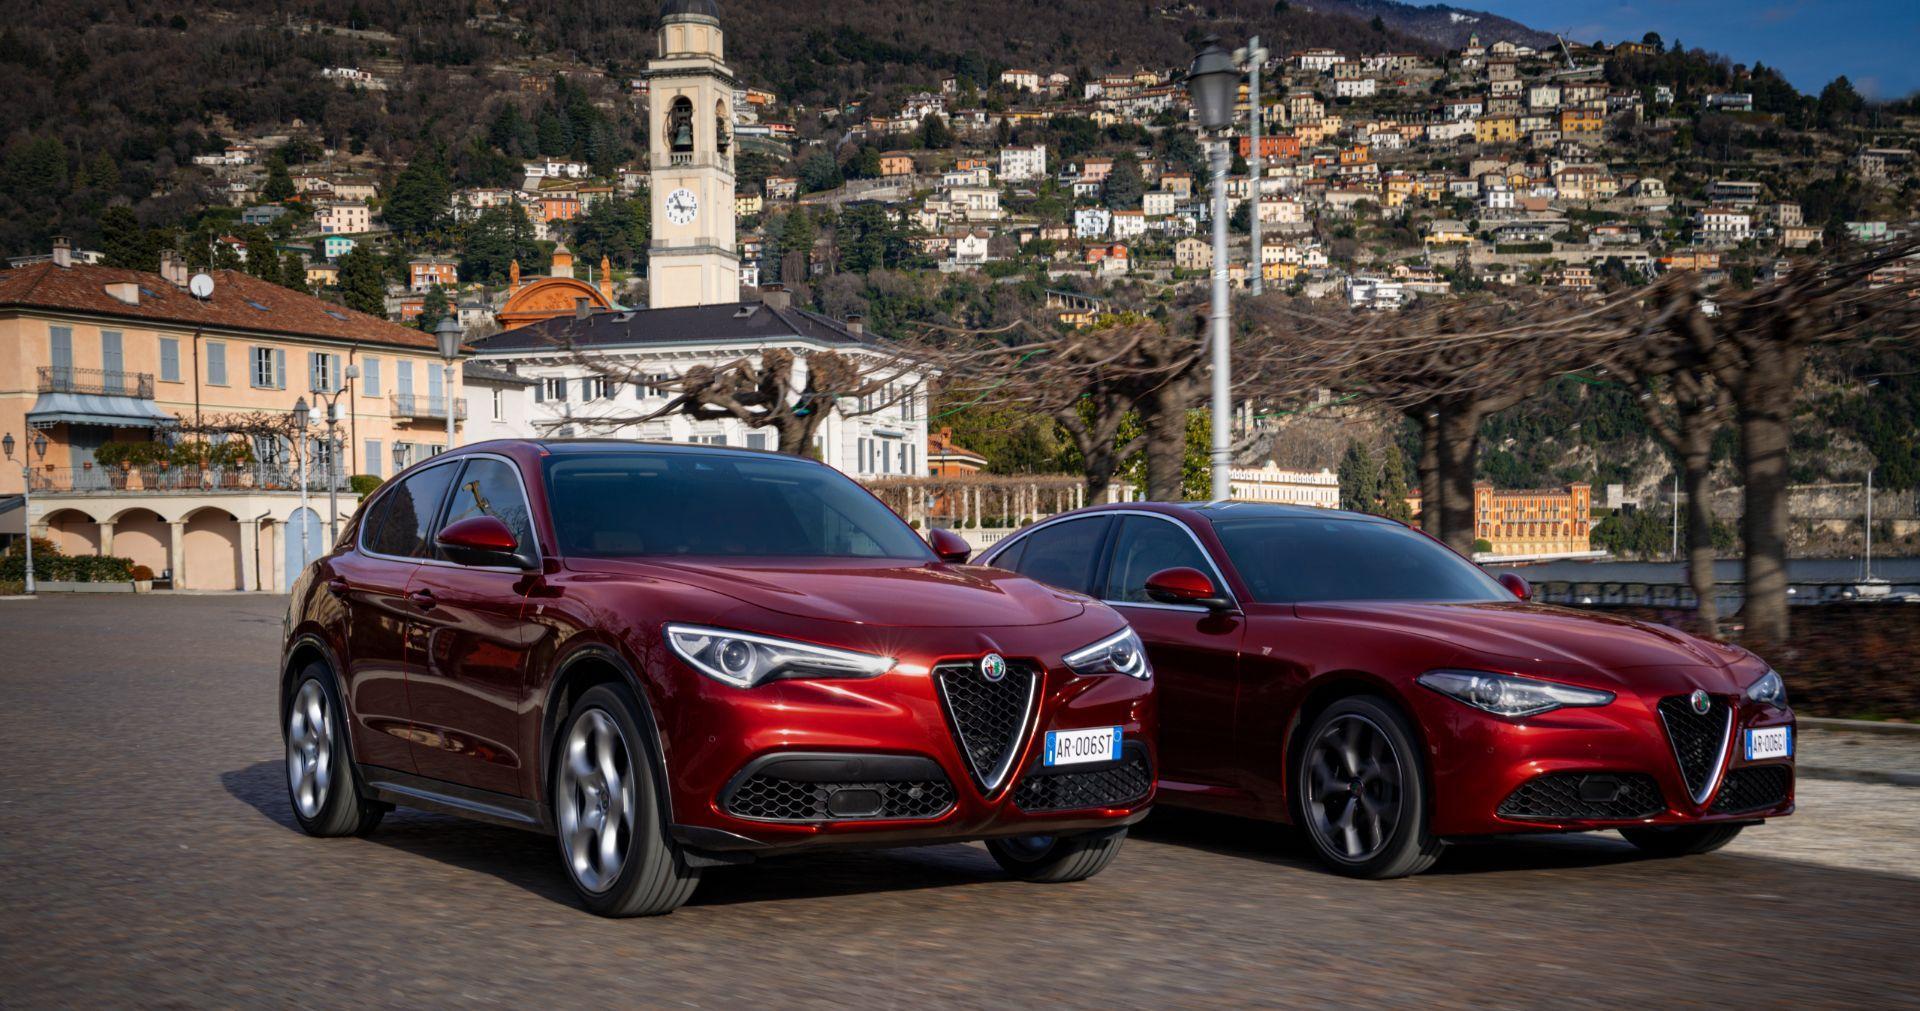 Alfa-Romeo-Giulia-and-Stelvio-6C-Villa-dEste-2